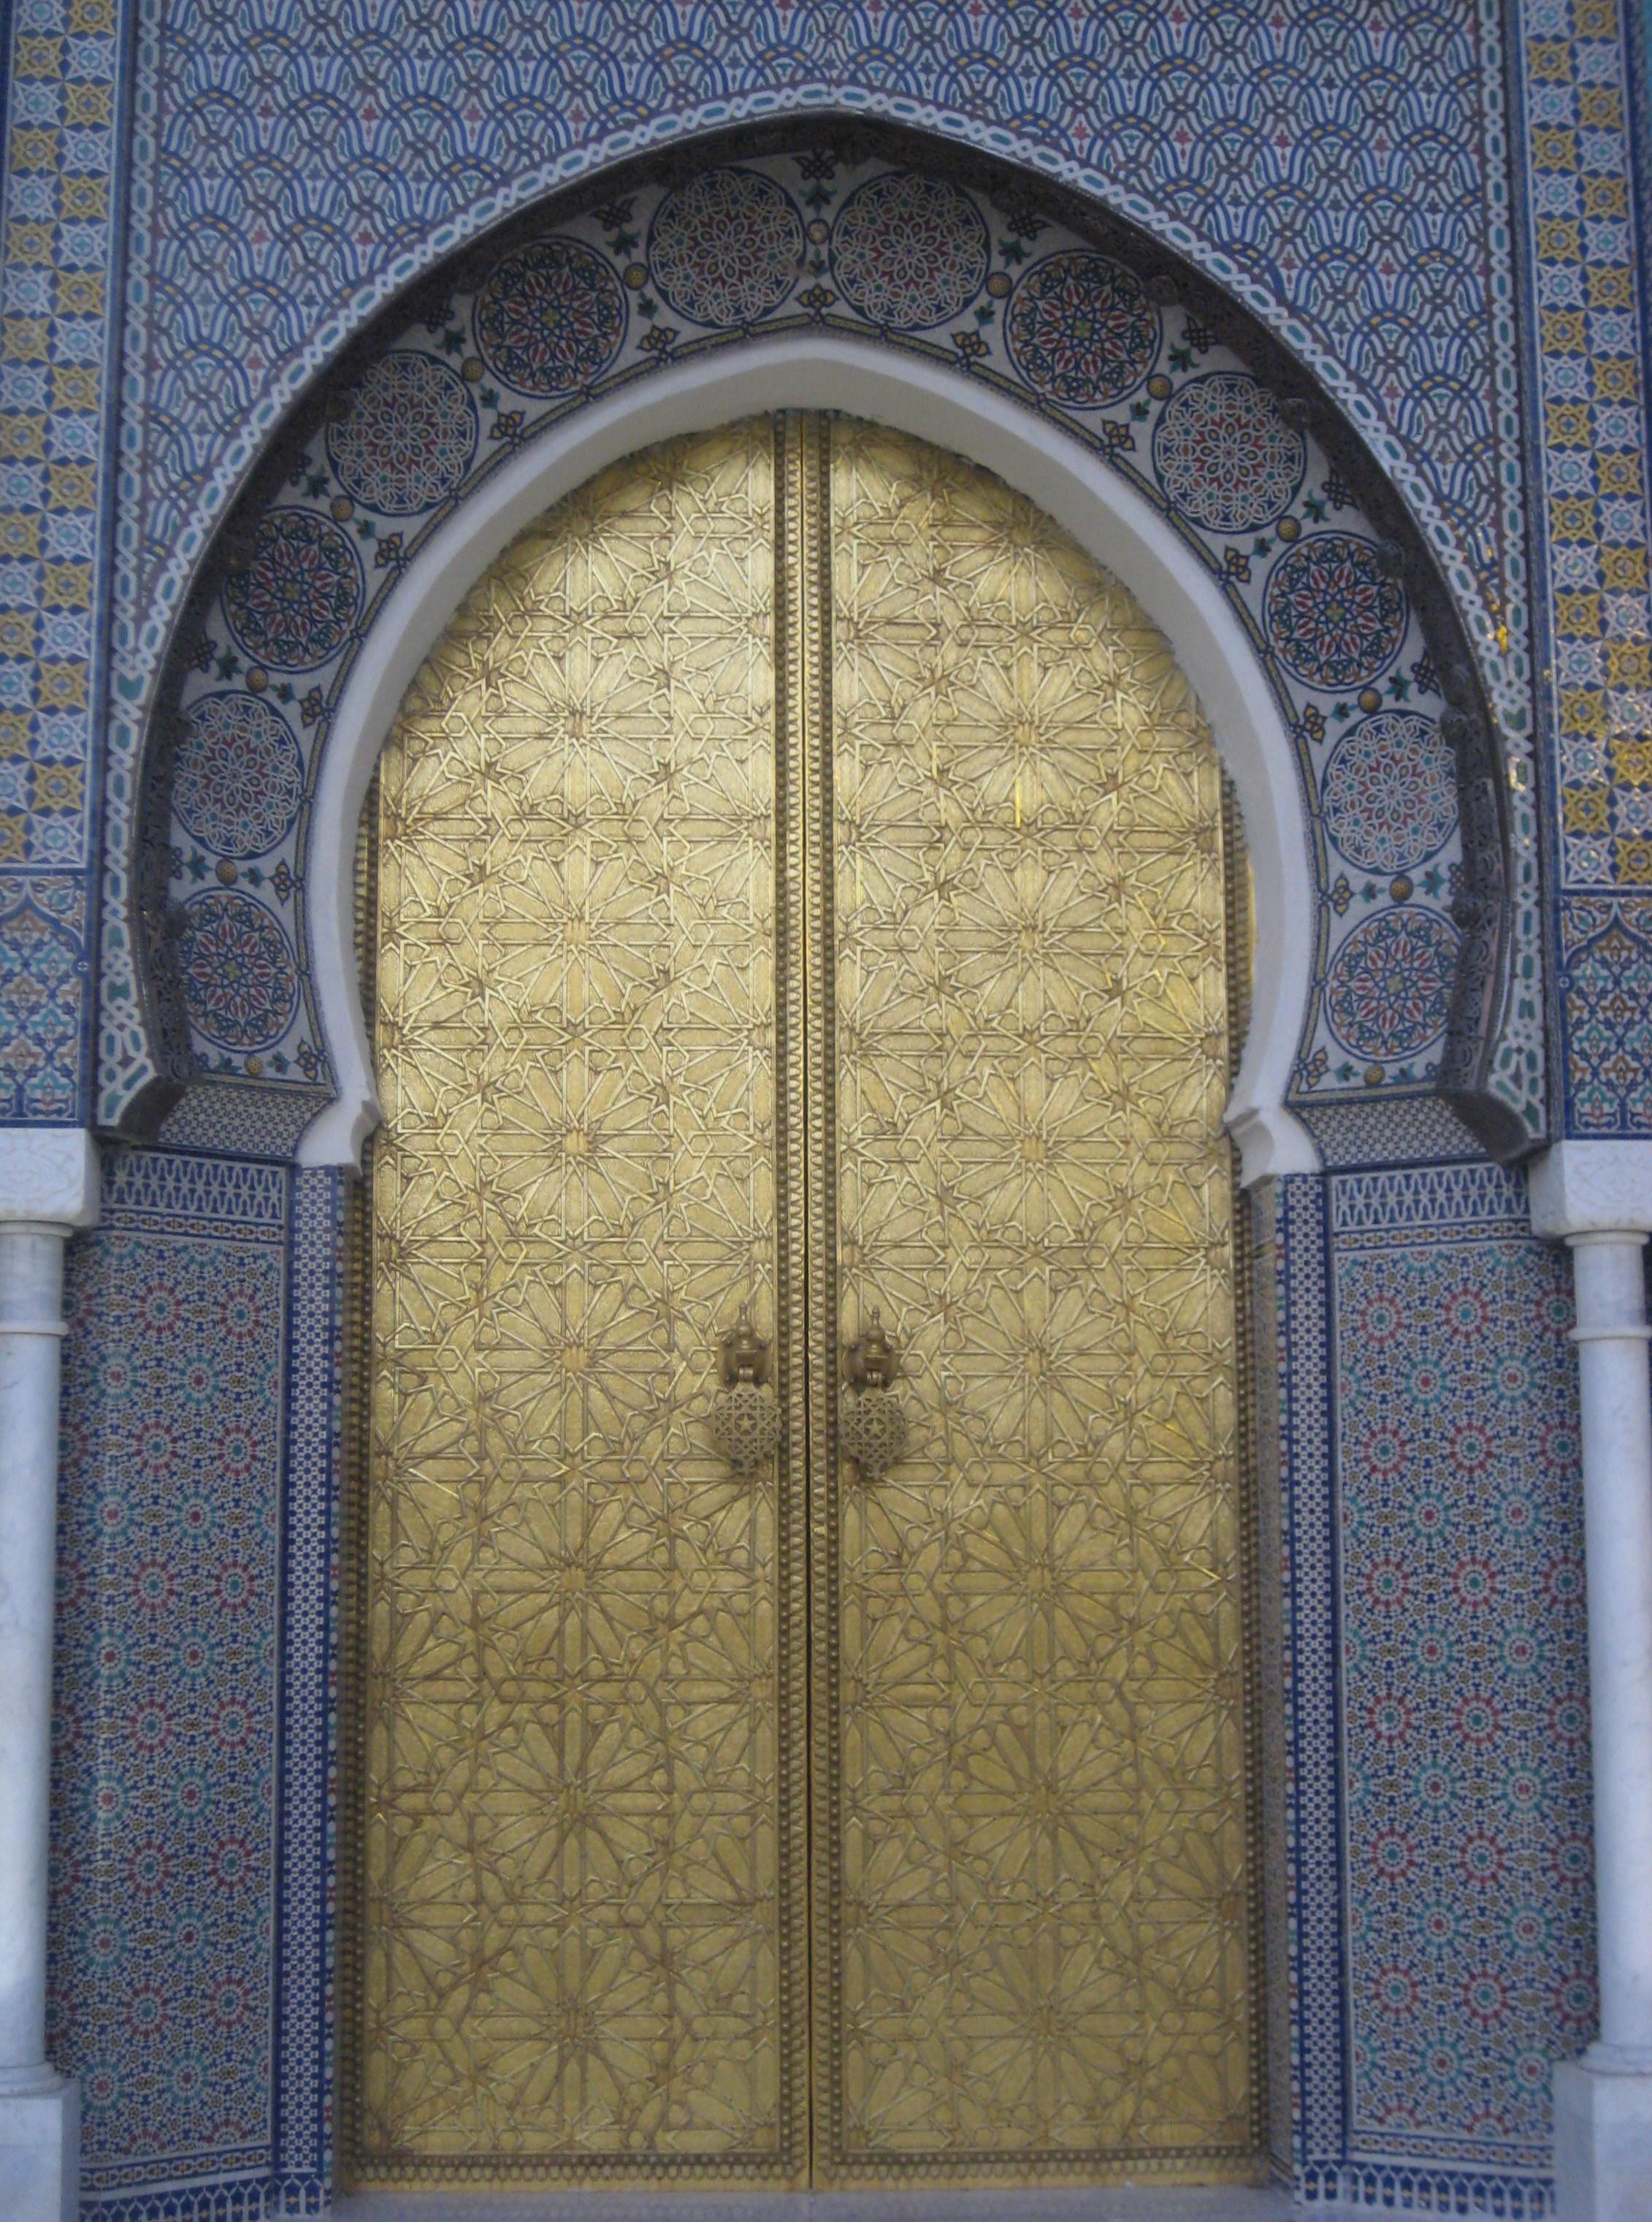 File:Golden Door Fes.JPG & File:Golden Door Fes.JPG - Wikimedia Commons Pezcame.Com